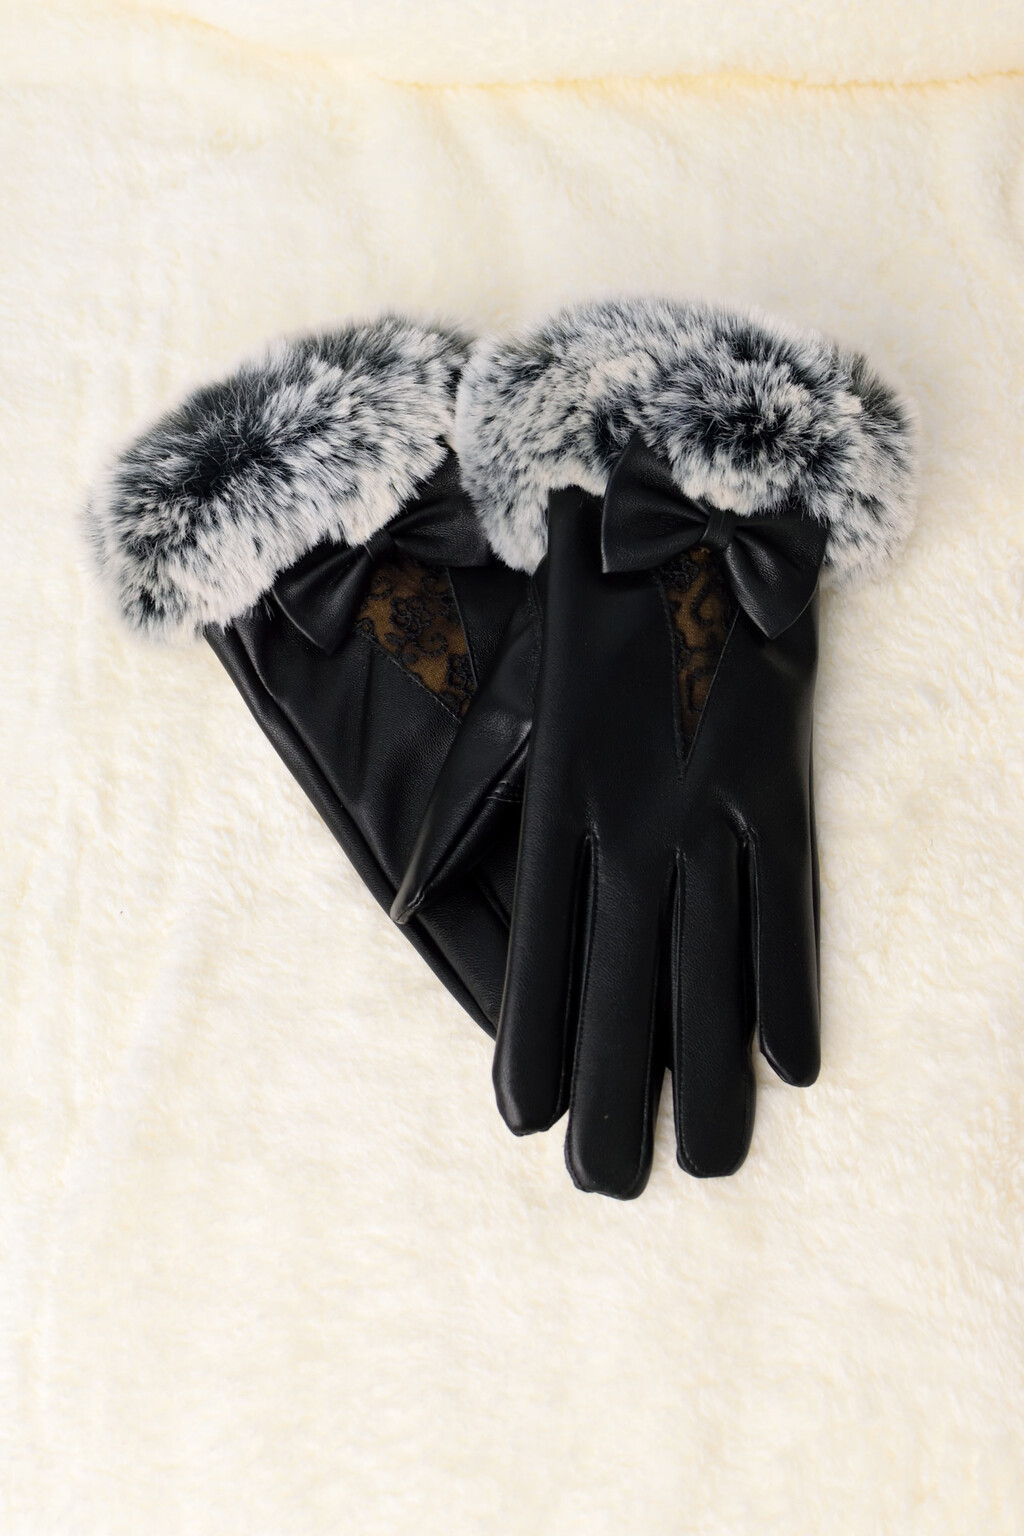 c5c26c4ff3 Γυναικεία δερμάτινα γάντια